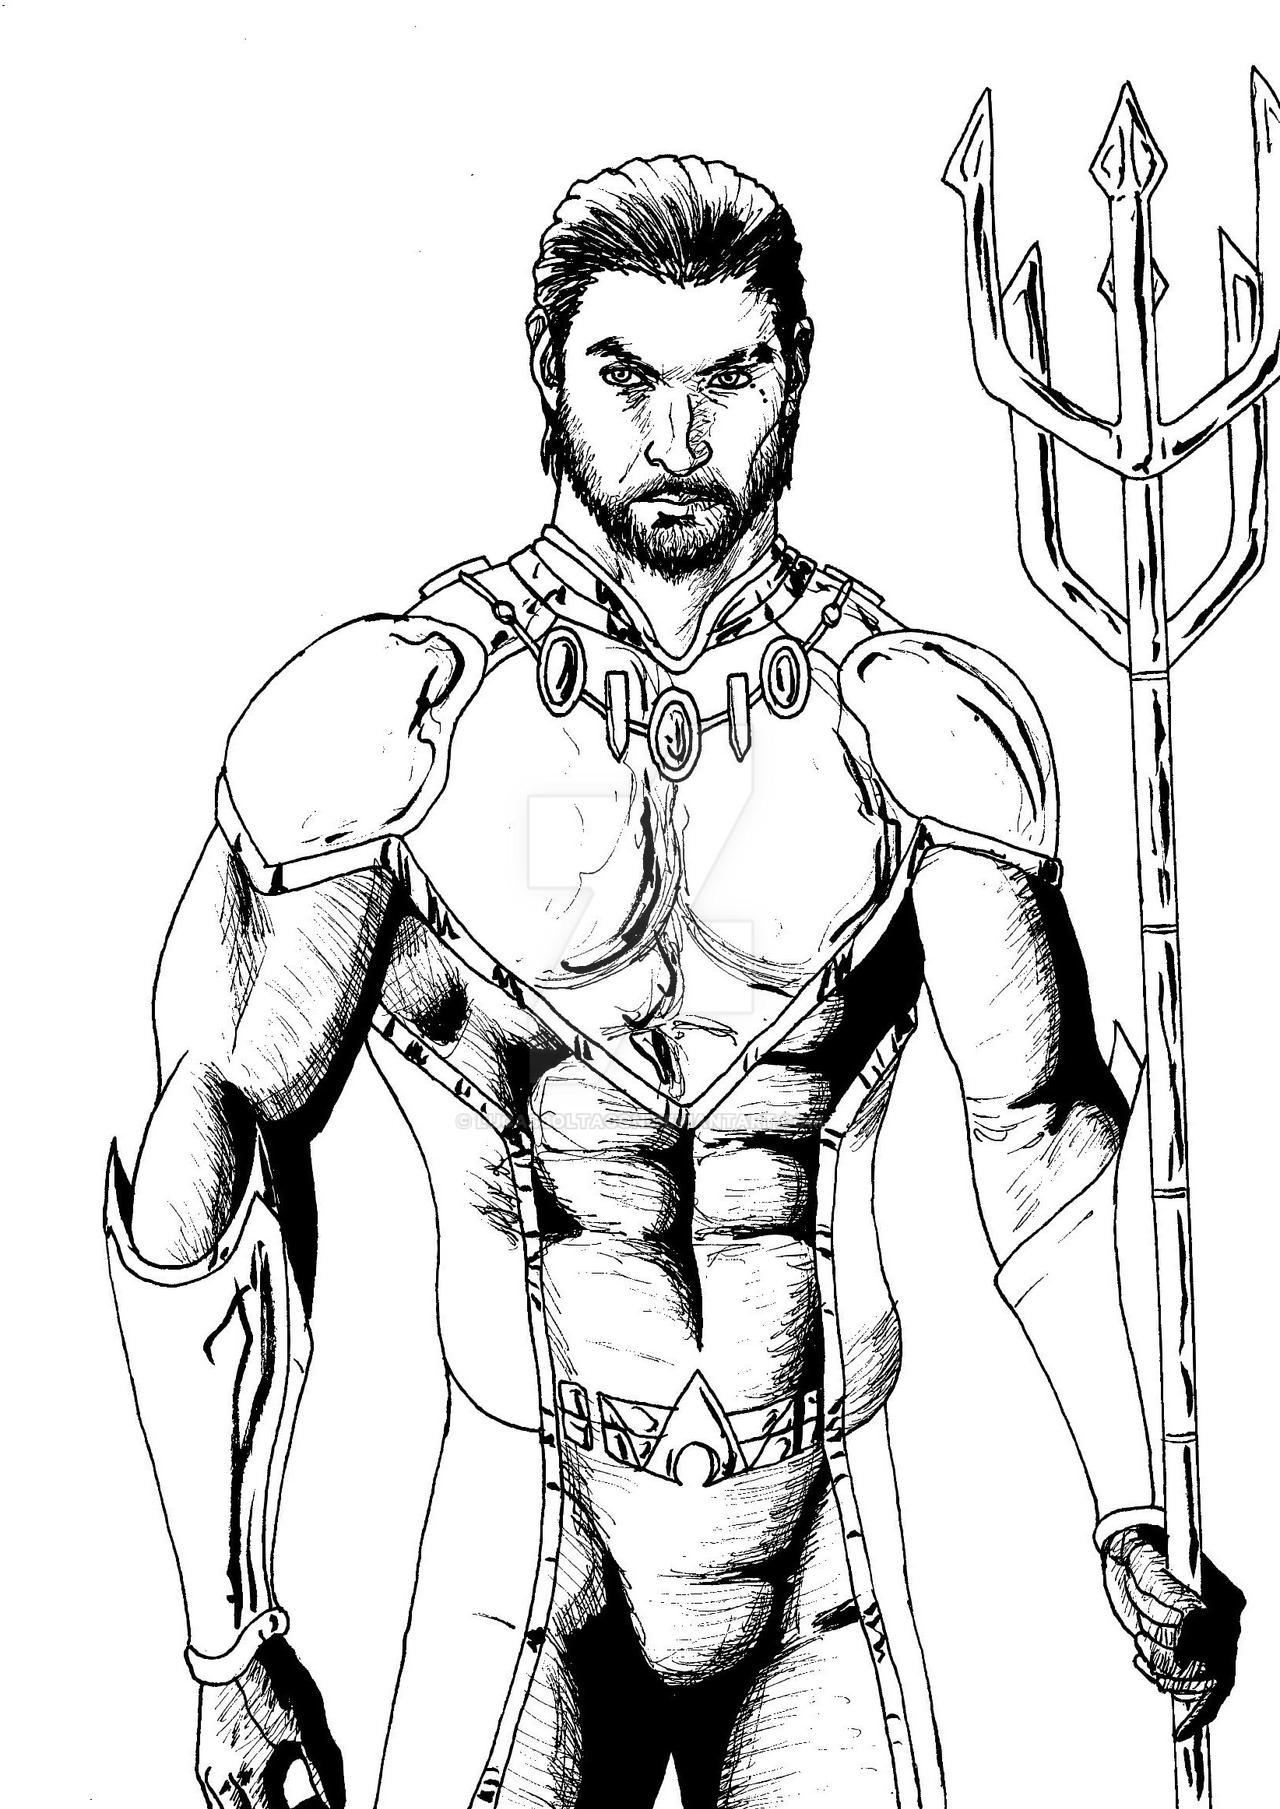 Jason Momoa As Aquaman Bw 001 By Lucasboltagon On Deviantart